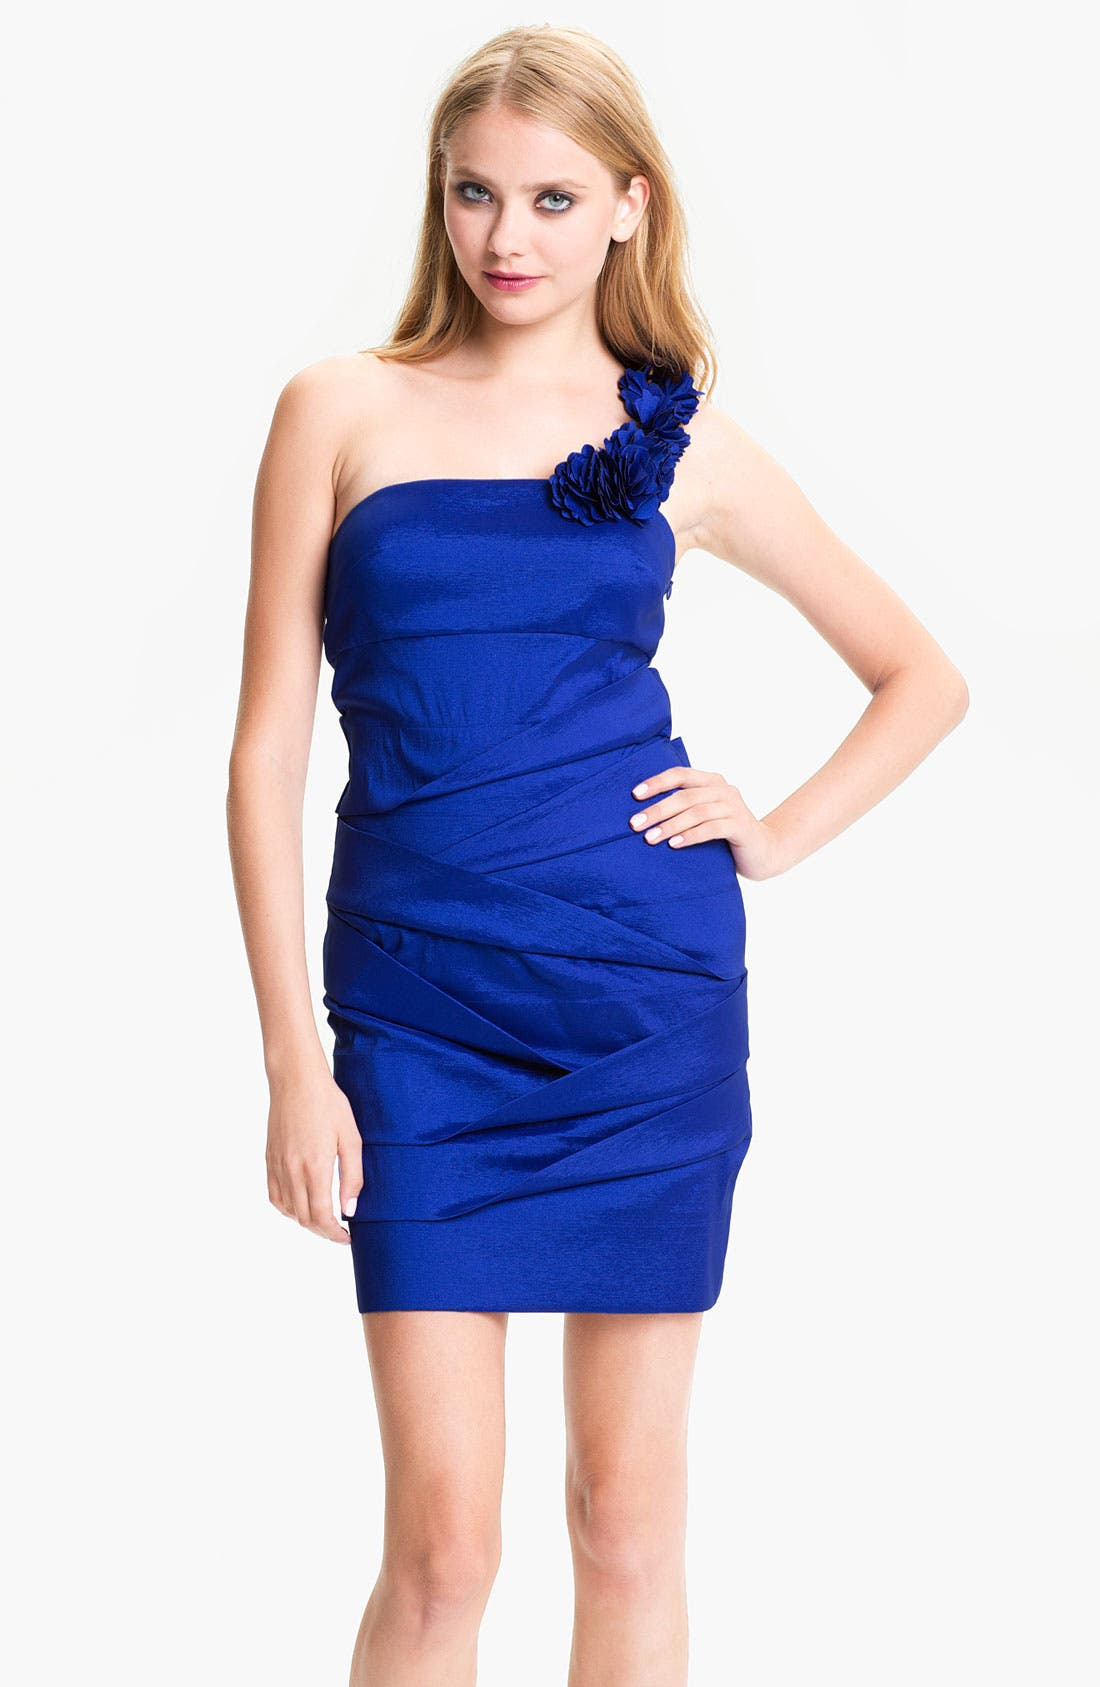 Main Image - Hailey by Adrianna Papell Petal Strap Origami Taffeta Dress